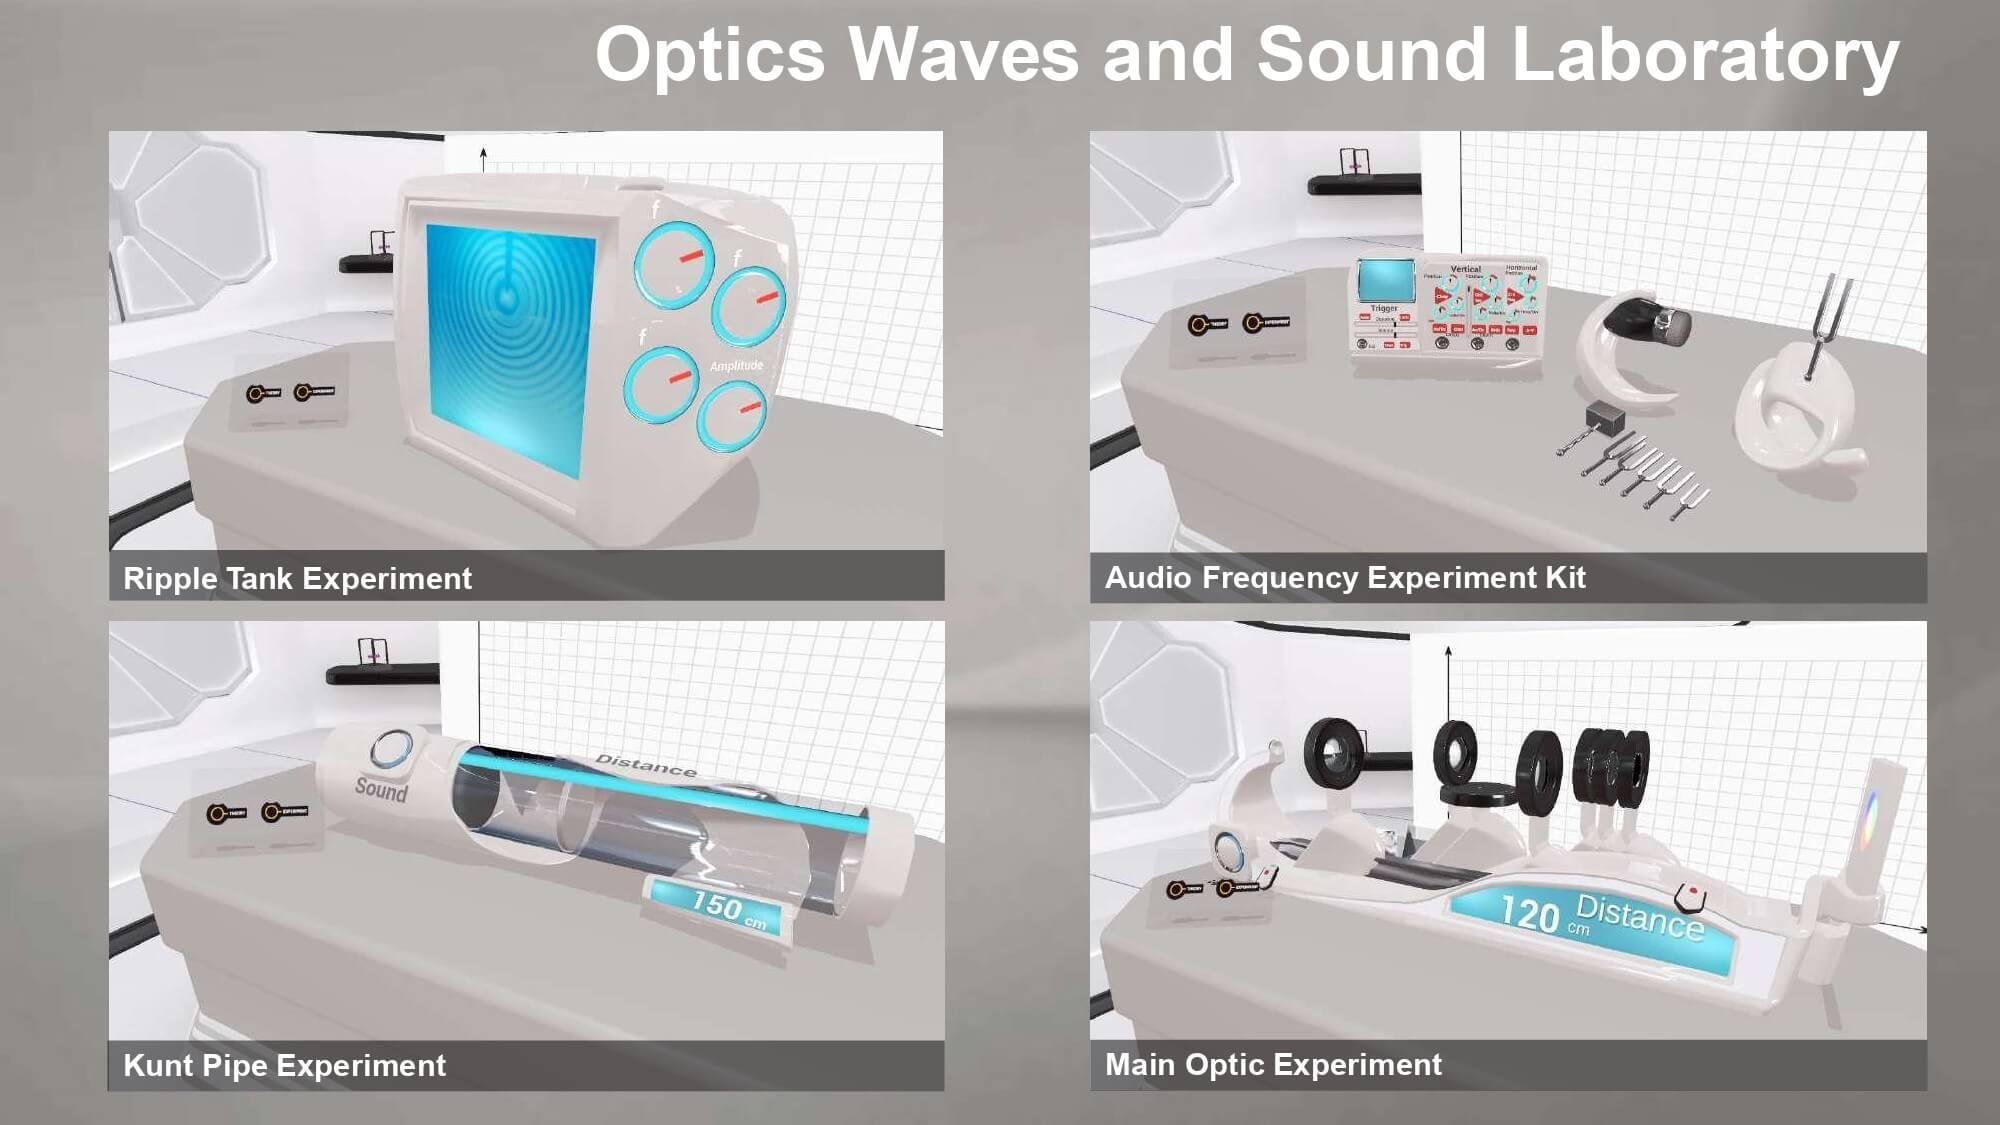 Optics and Waves Laboratory